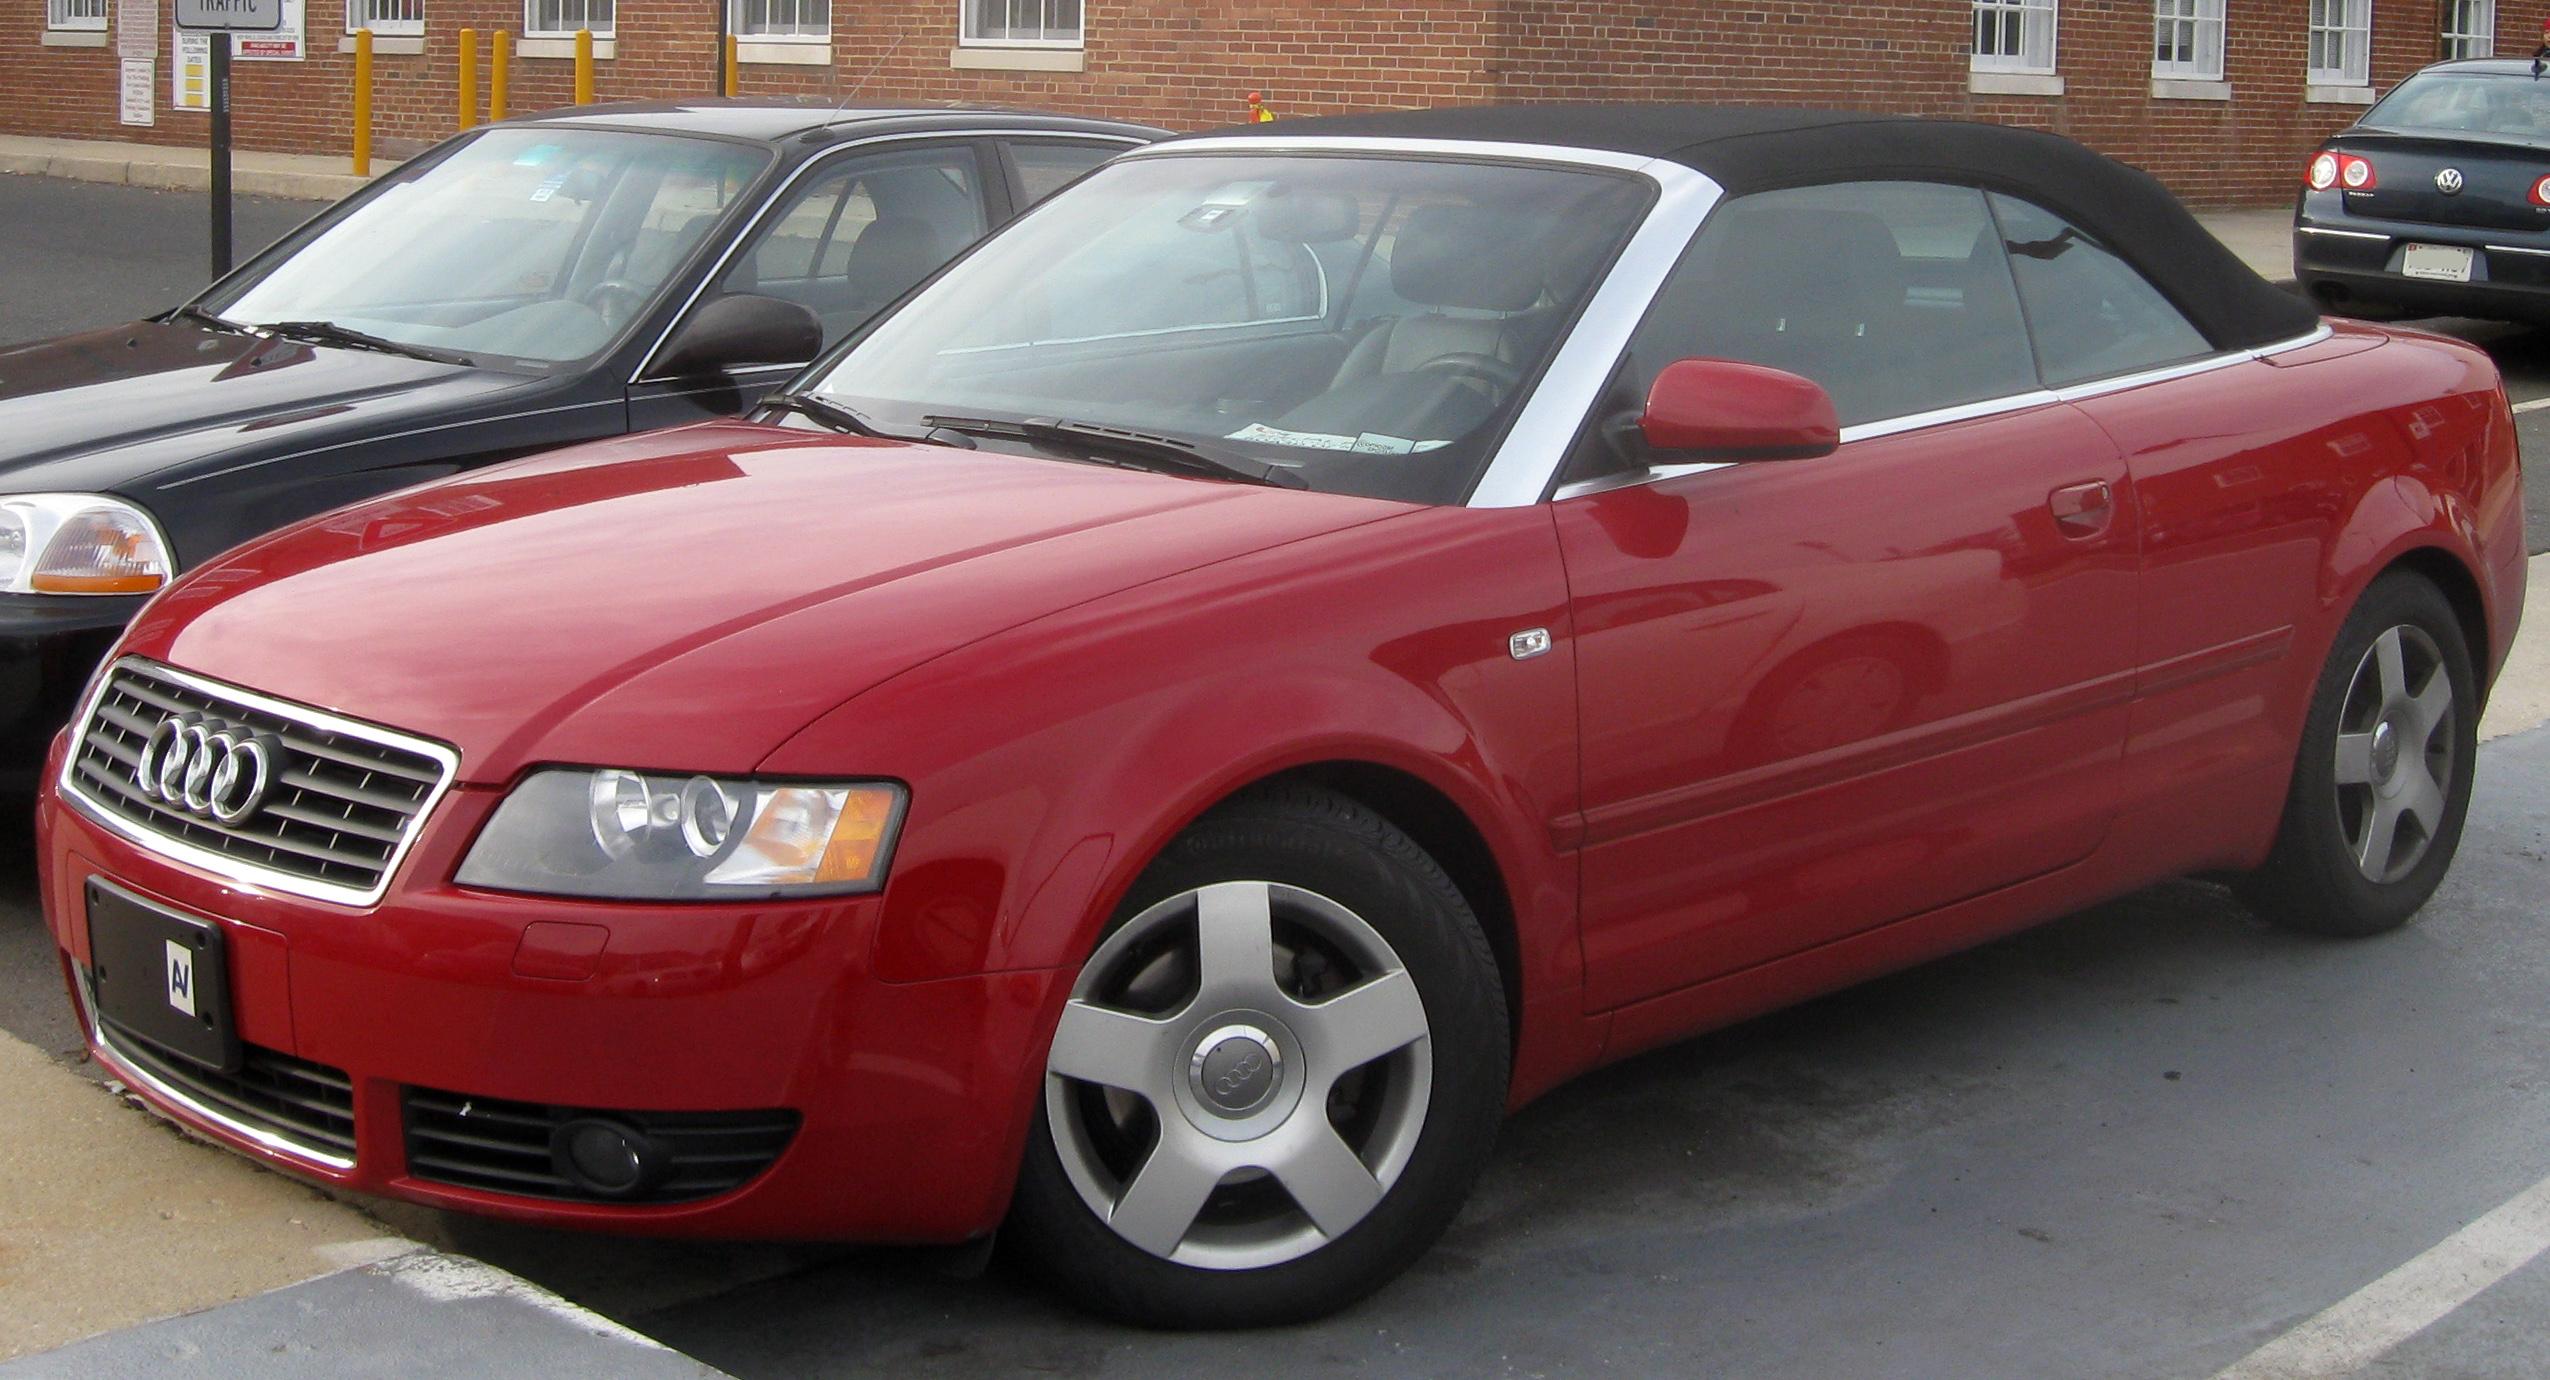 FileAudi A T Convertiblejpg Wikimedia Commons - Audi a4 convertible